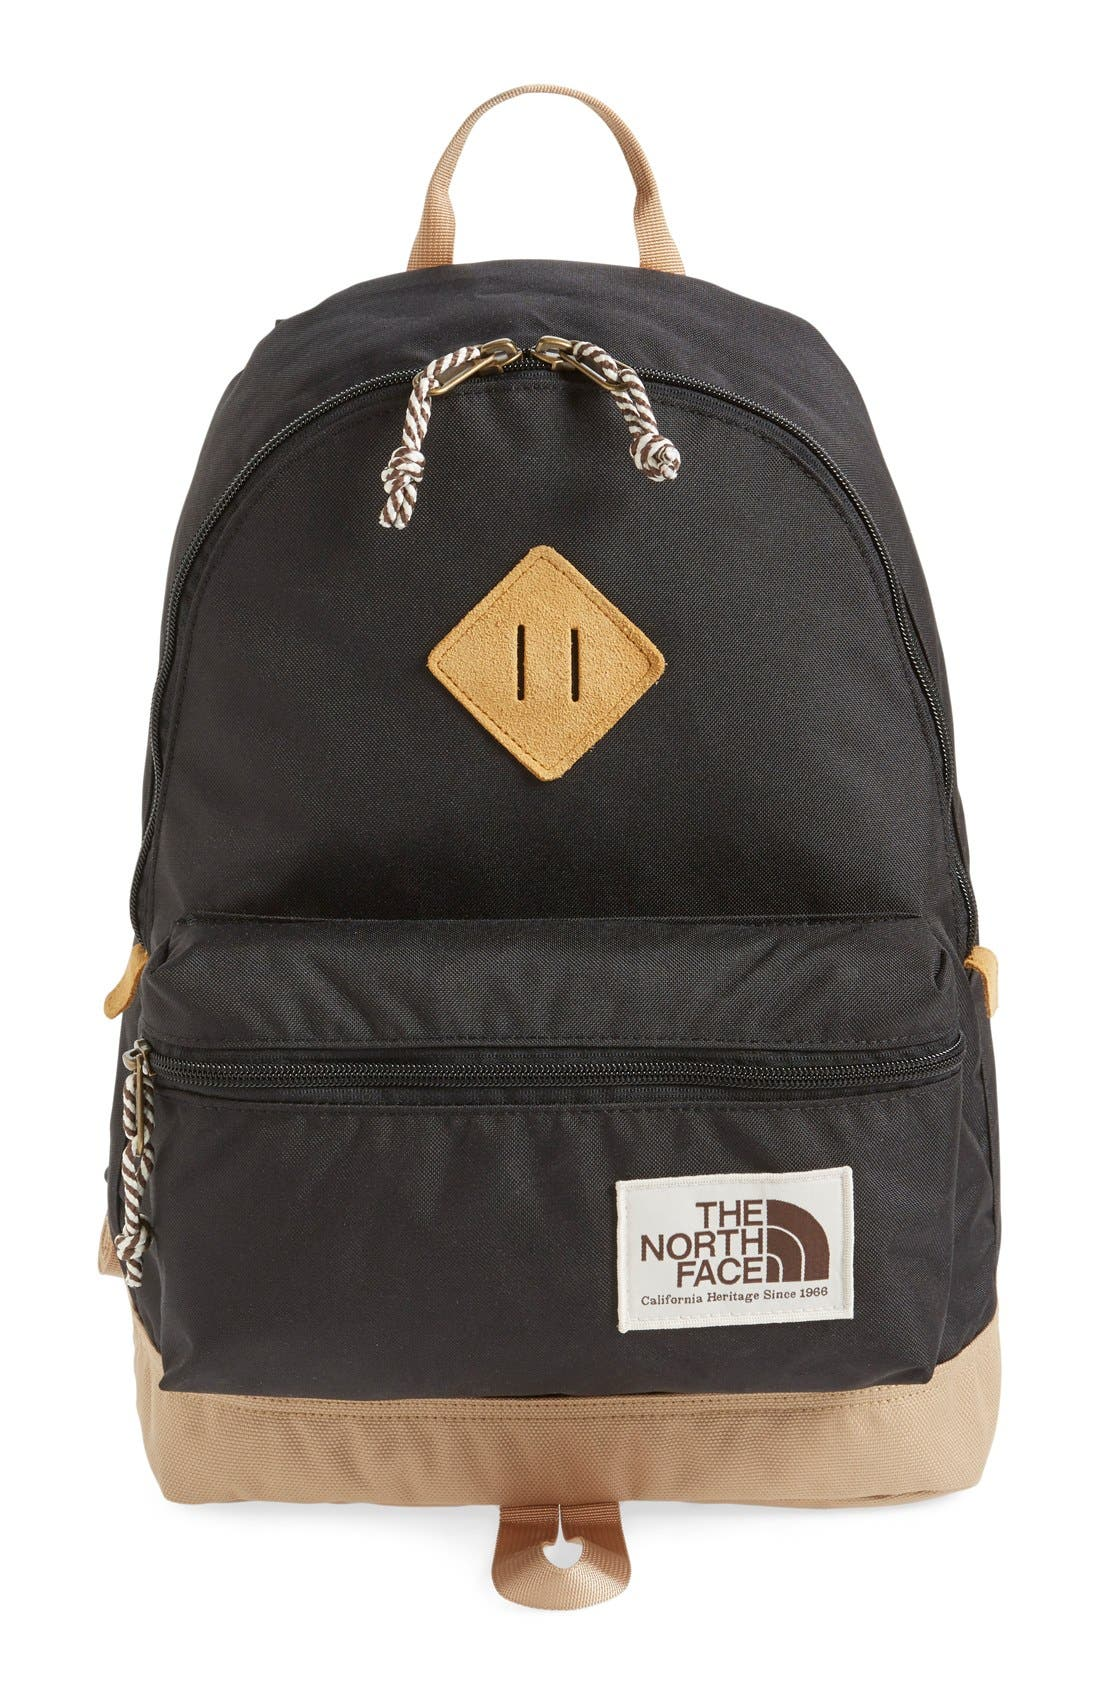 THE NORTH FACE,                             'Mini Berkeley' Backpack,                             Main thumbnail 1, color,                             001